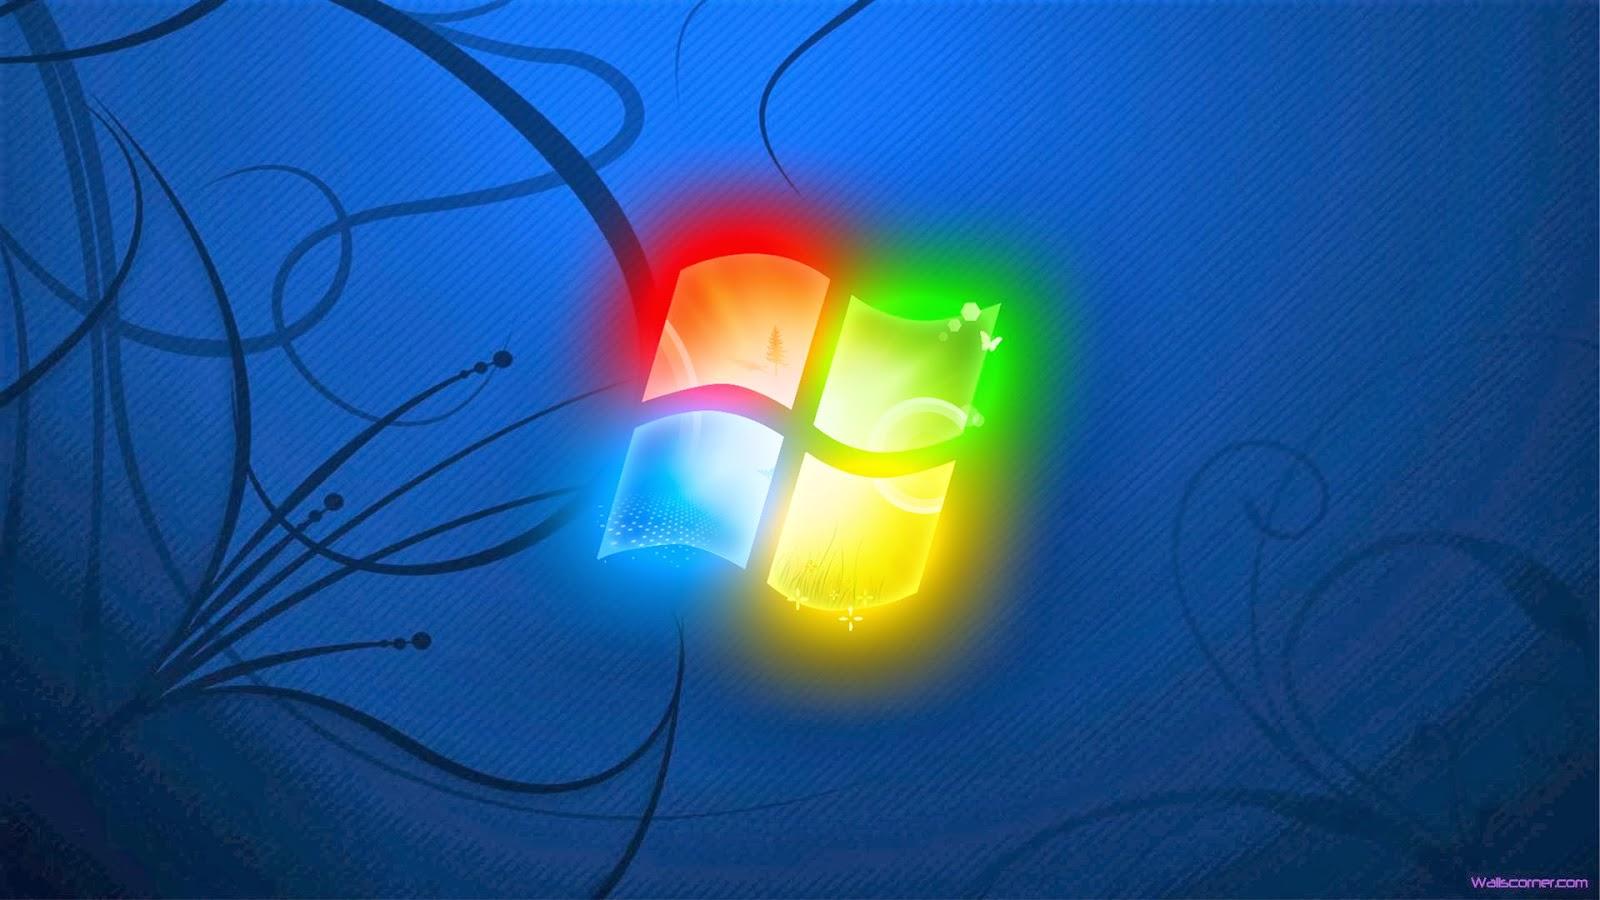 1080p windows 10 wallpaper wallpapersafari - Windows 10 wallpaper hd 1080p ...